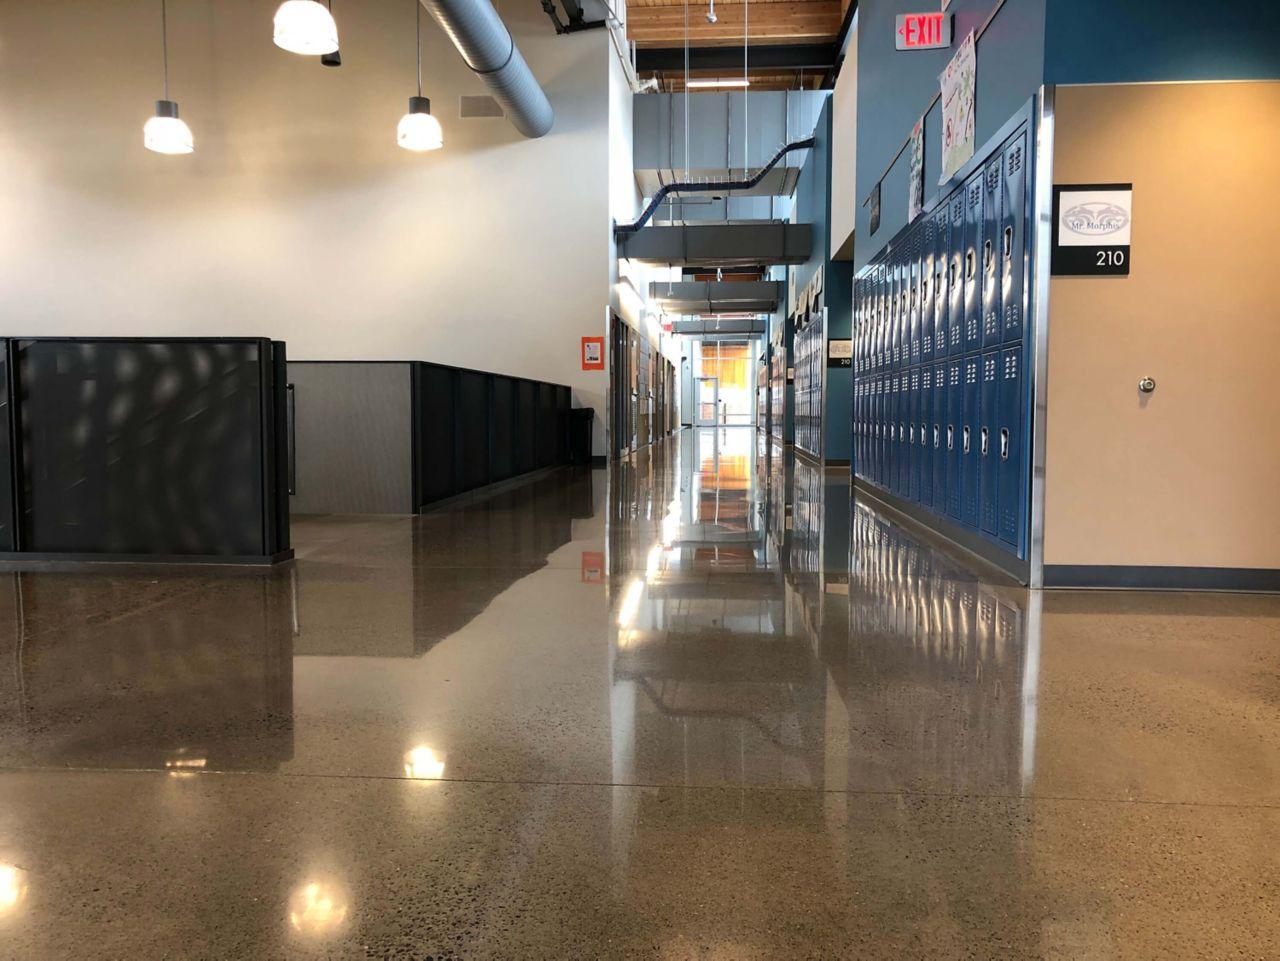 Resinous Floors & Walls for Food & Beverage